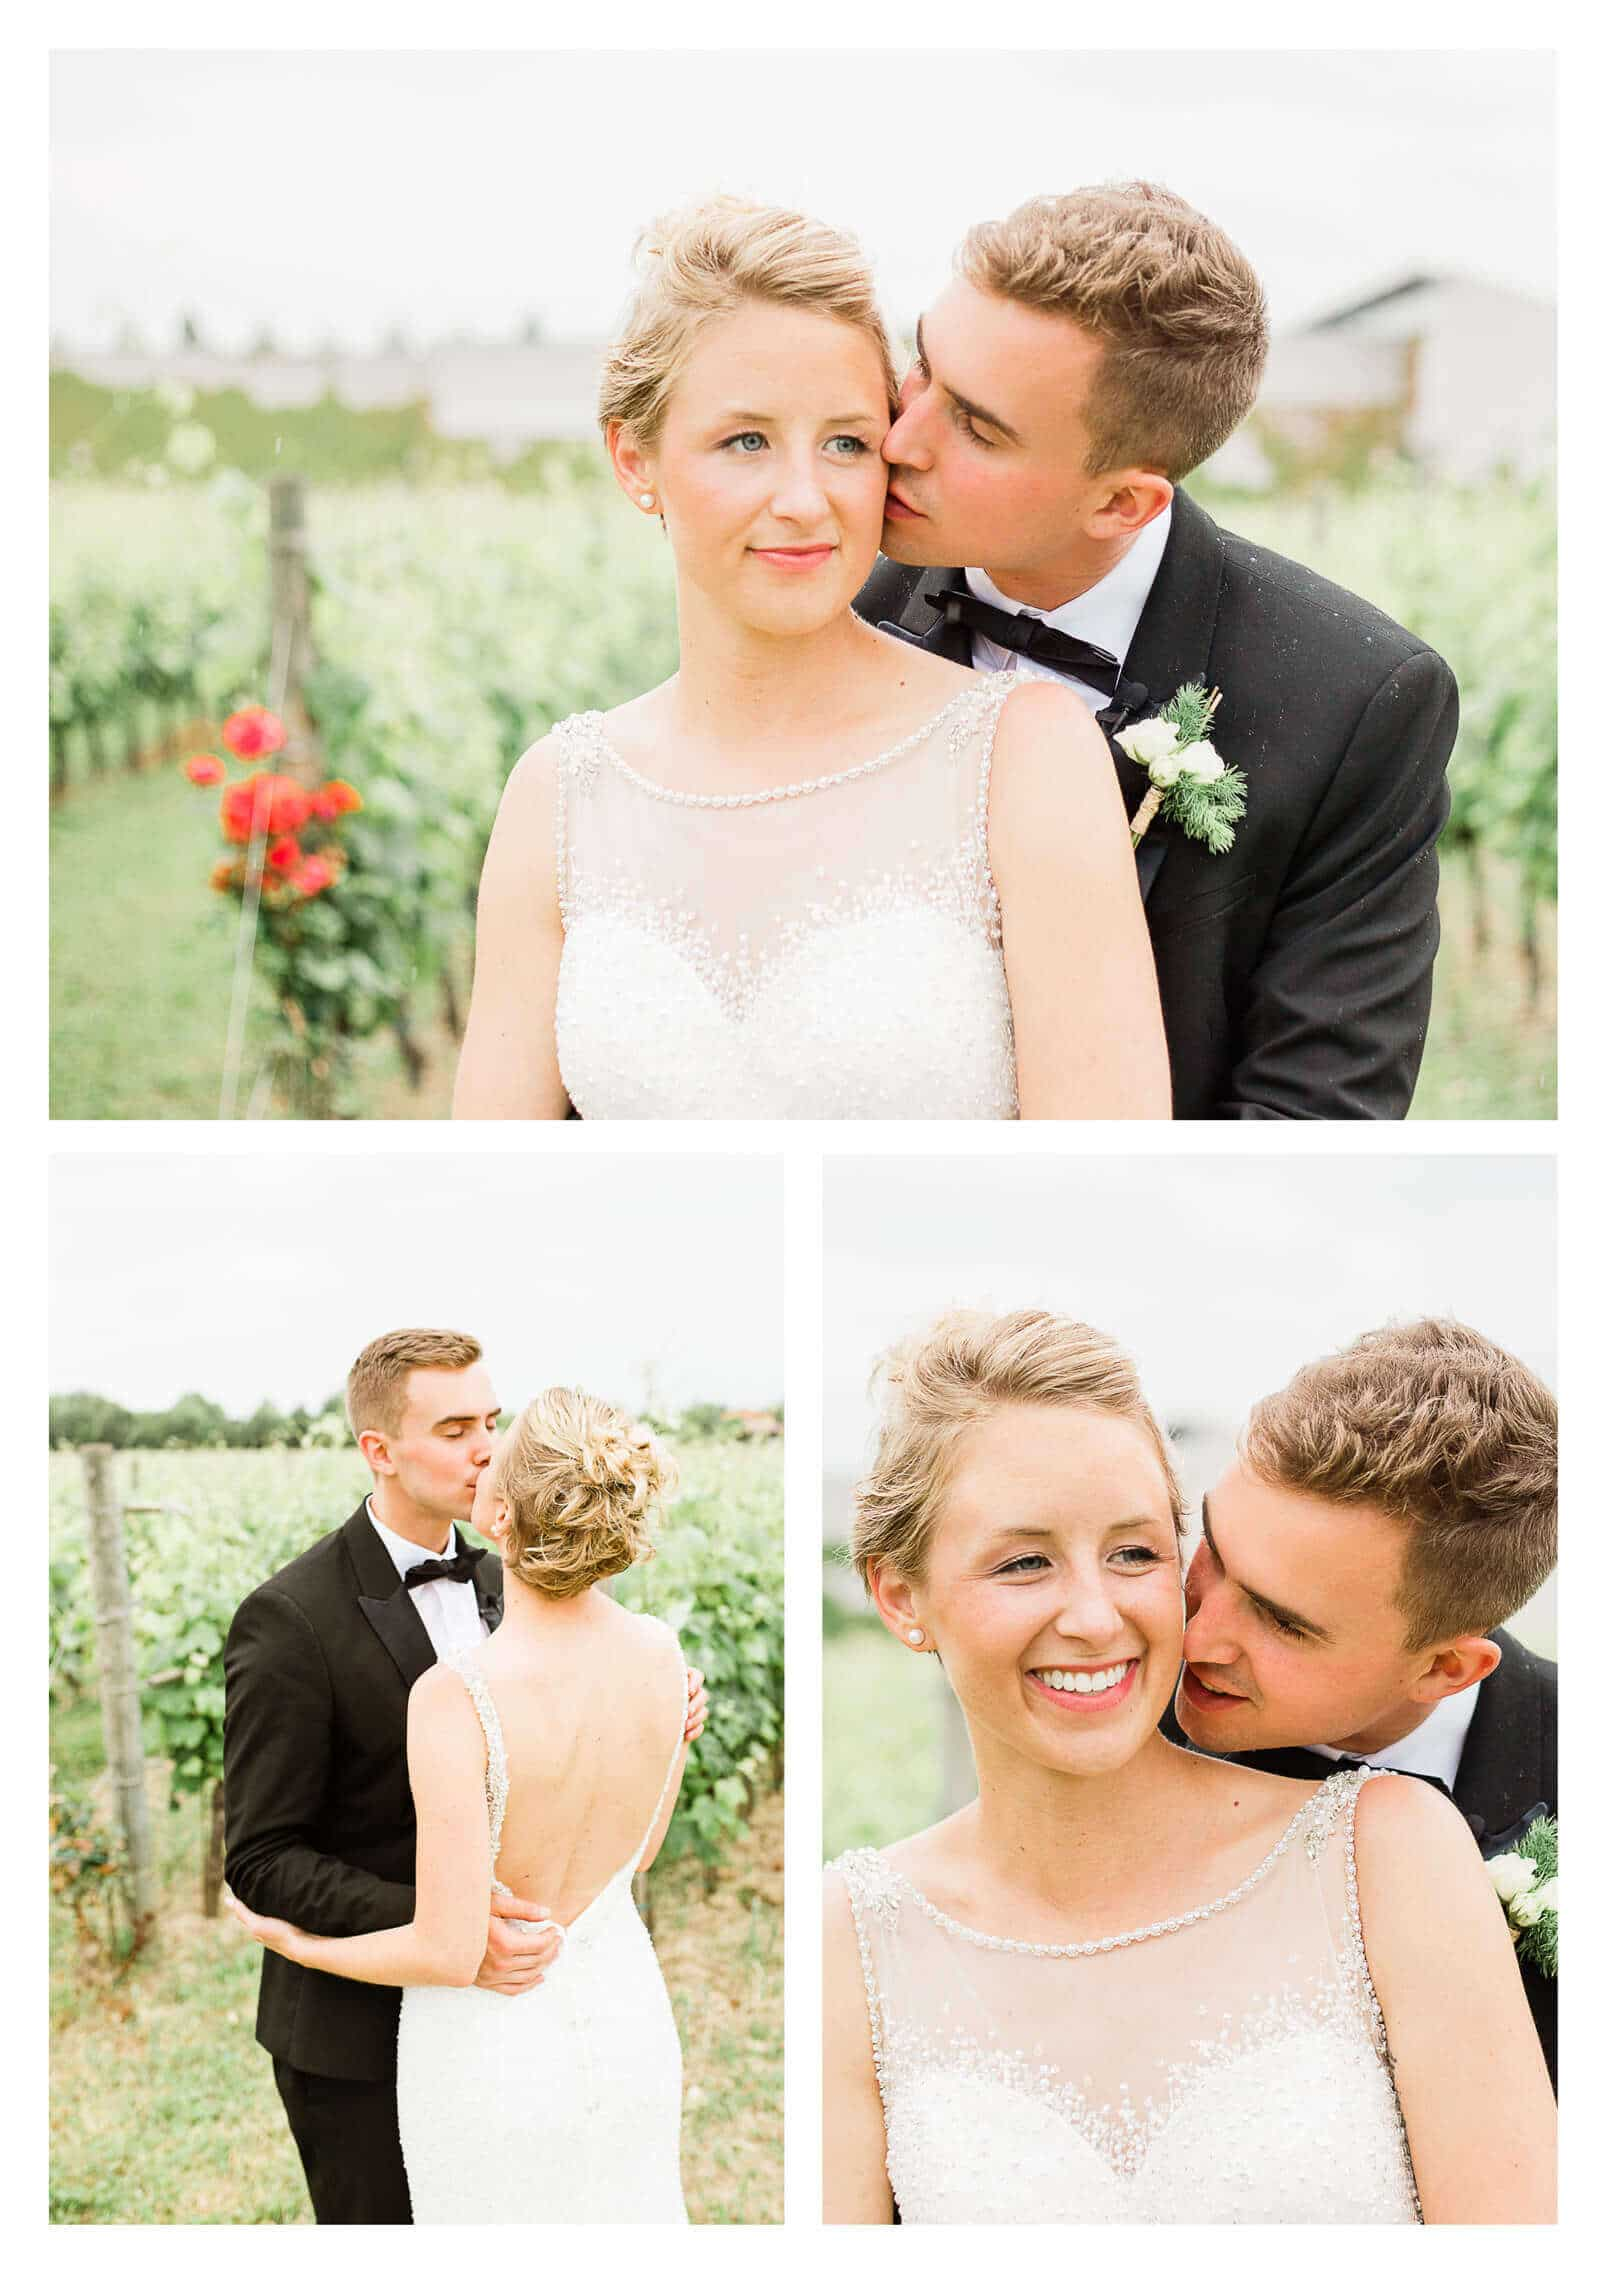 Fossa Mala wedding couple portraits in vineyard | Italy photographer